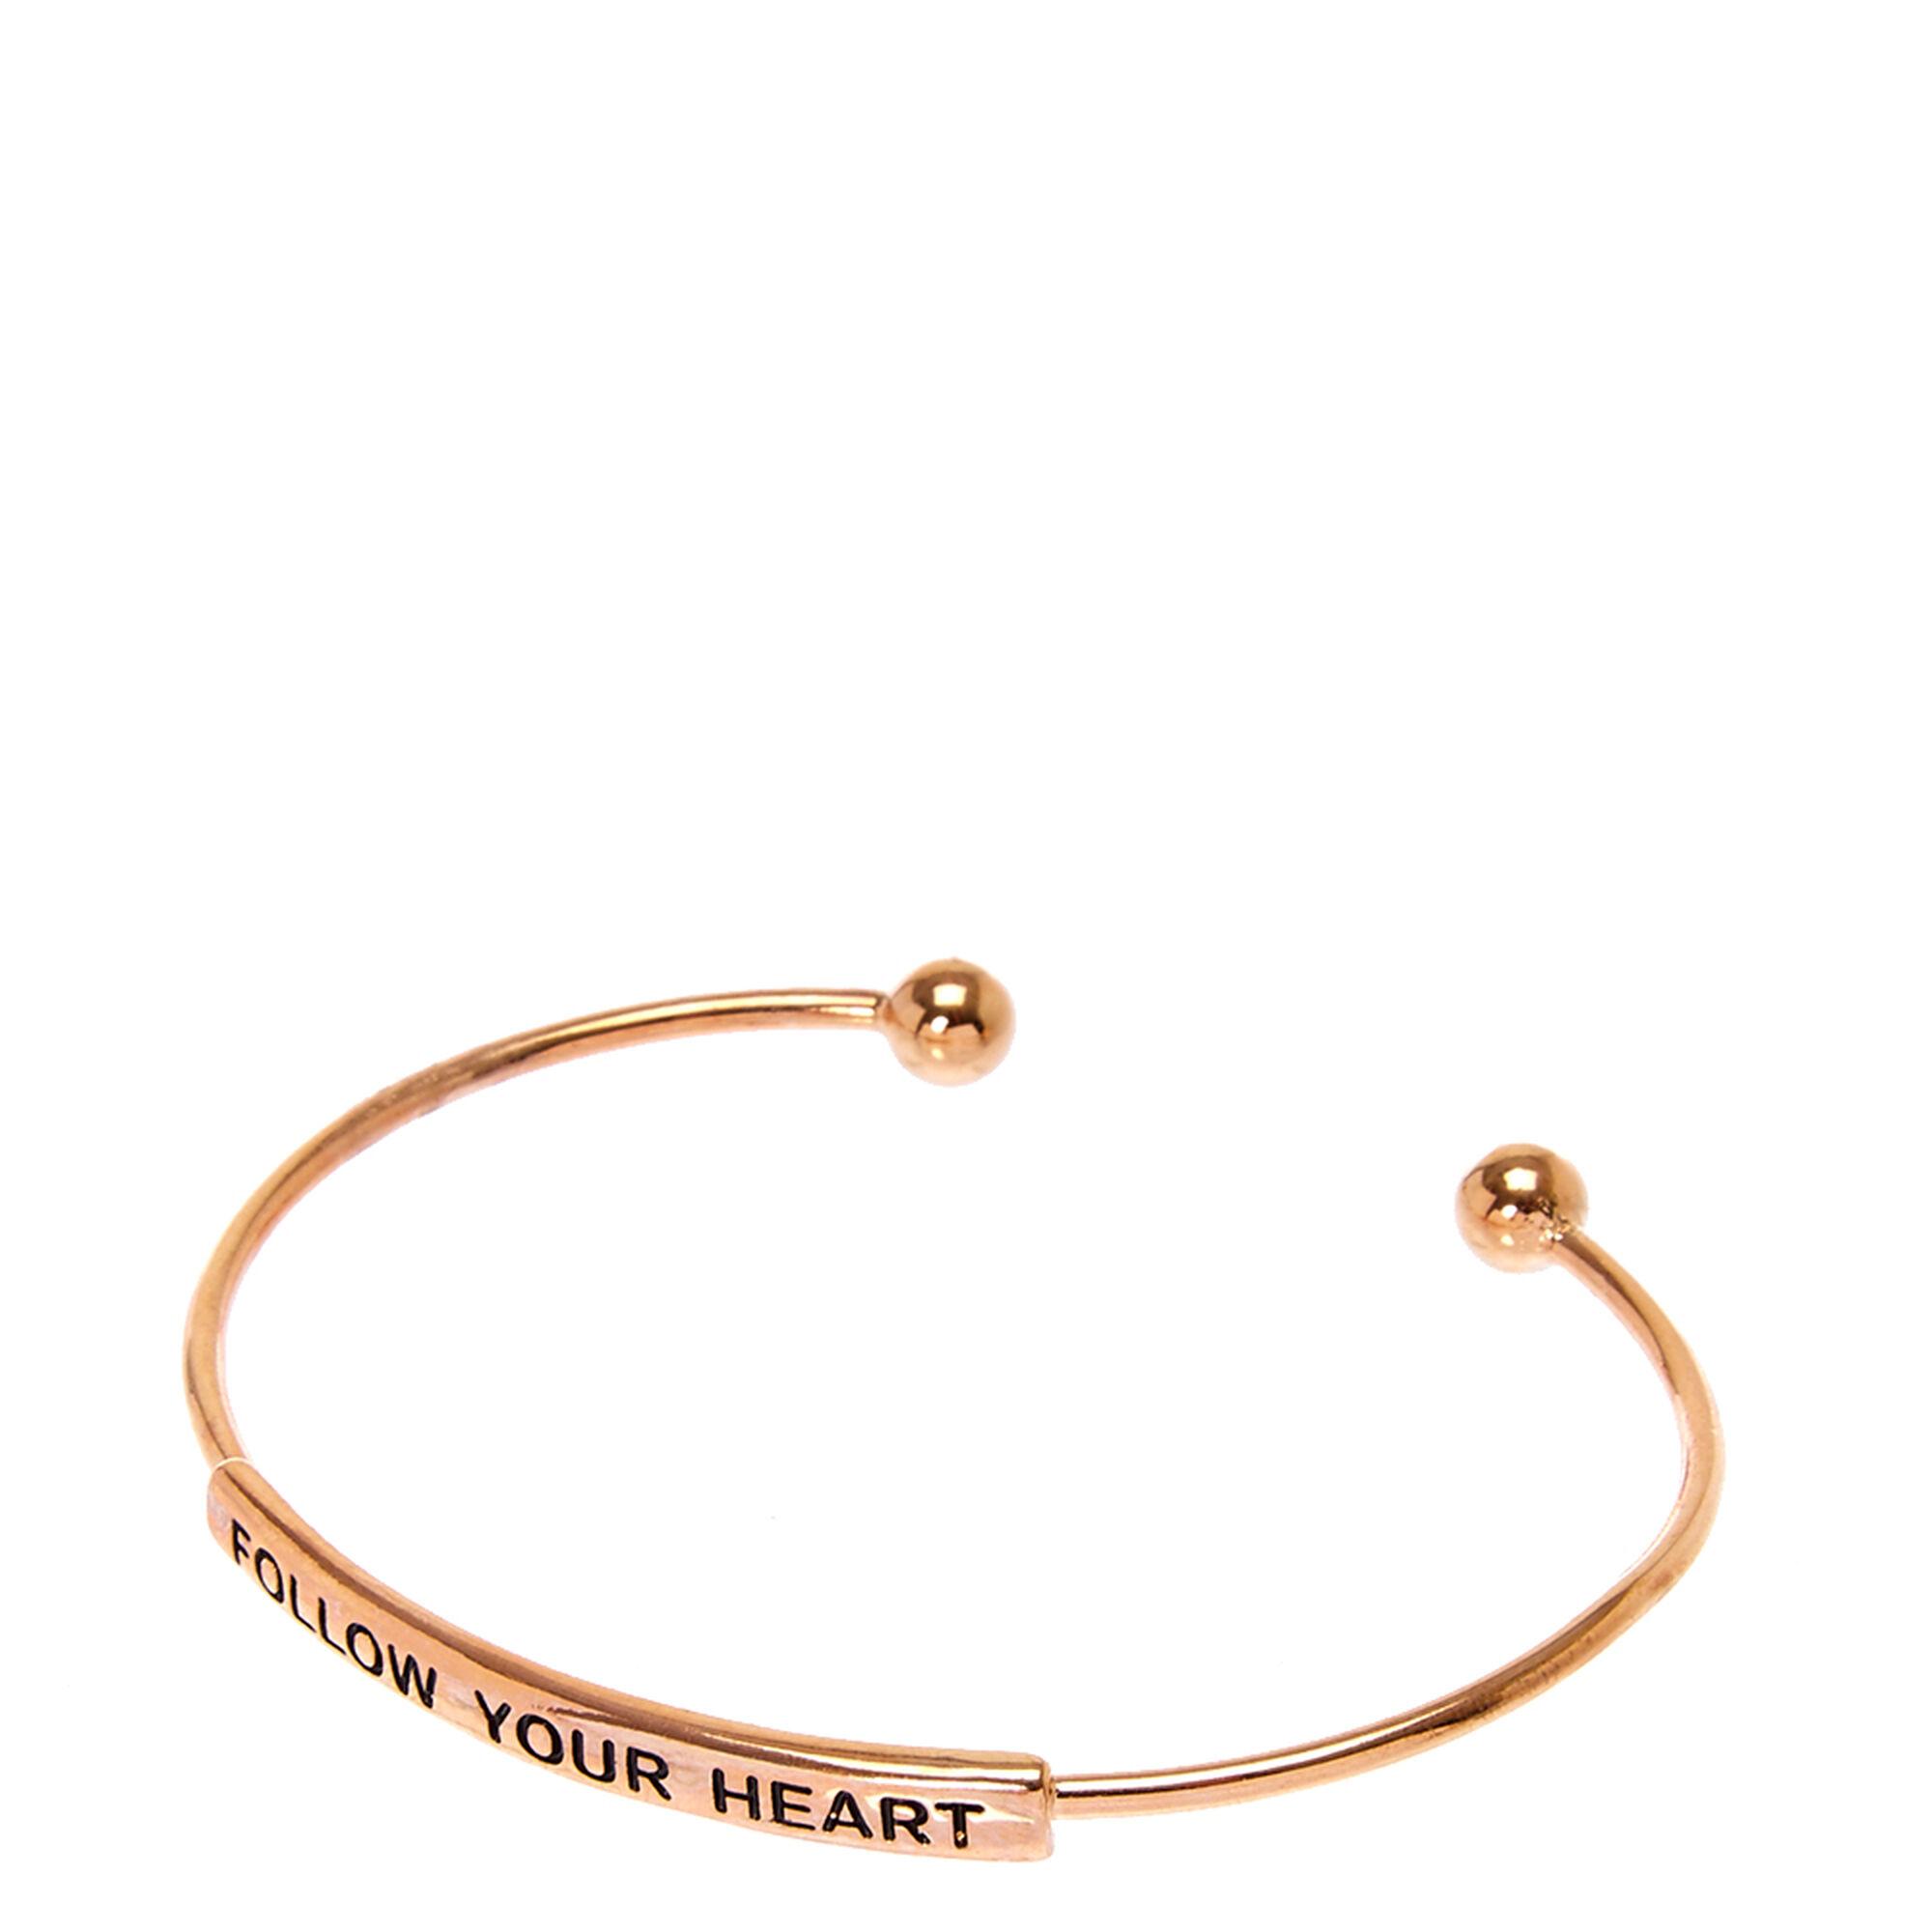 Follow Your Heart Cuff Bracelet